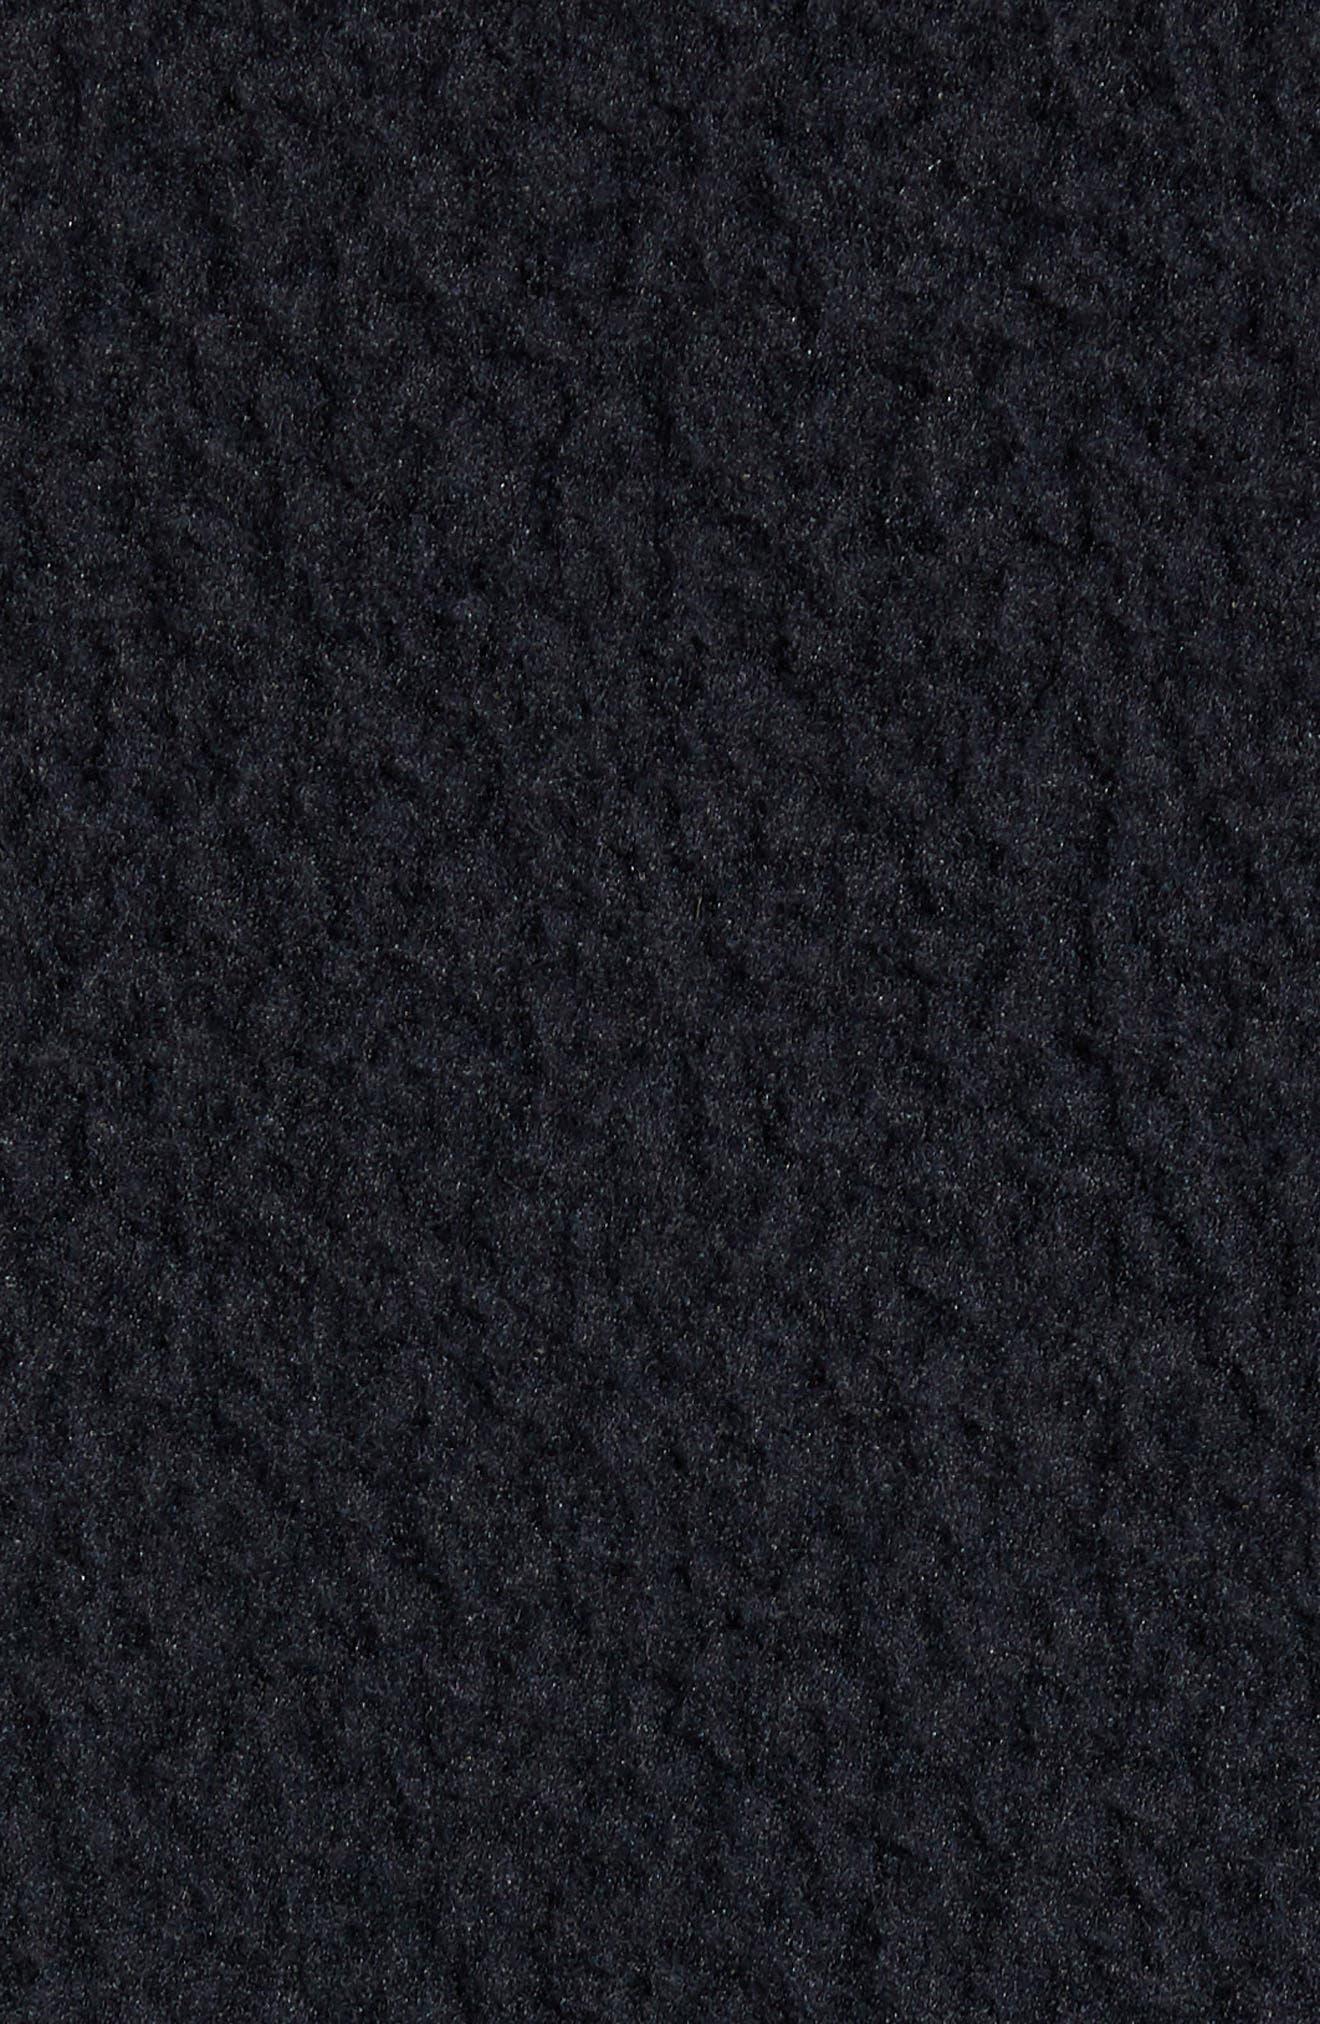 HERSCHEL SUPPLY CO.,                             Tech Fleece Jacket,                             Alternate thumbnail 7, color,                             001